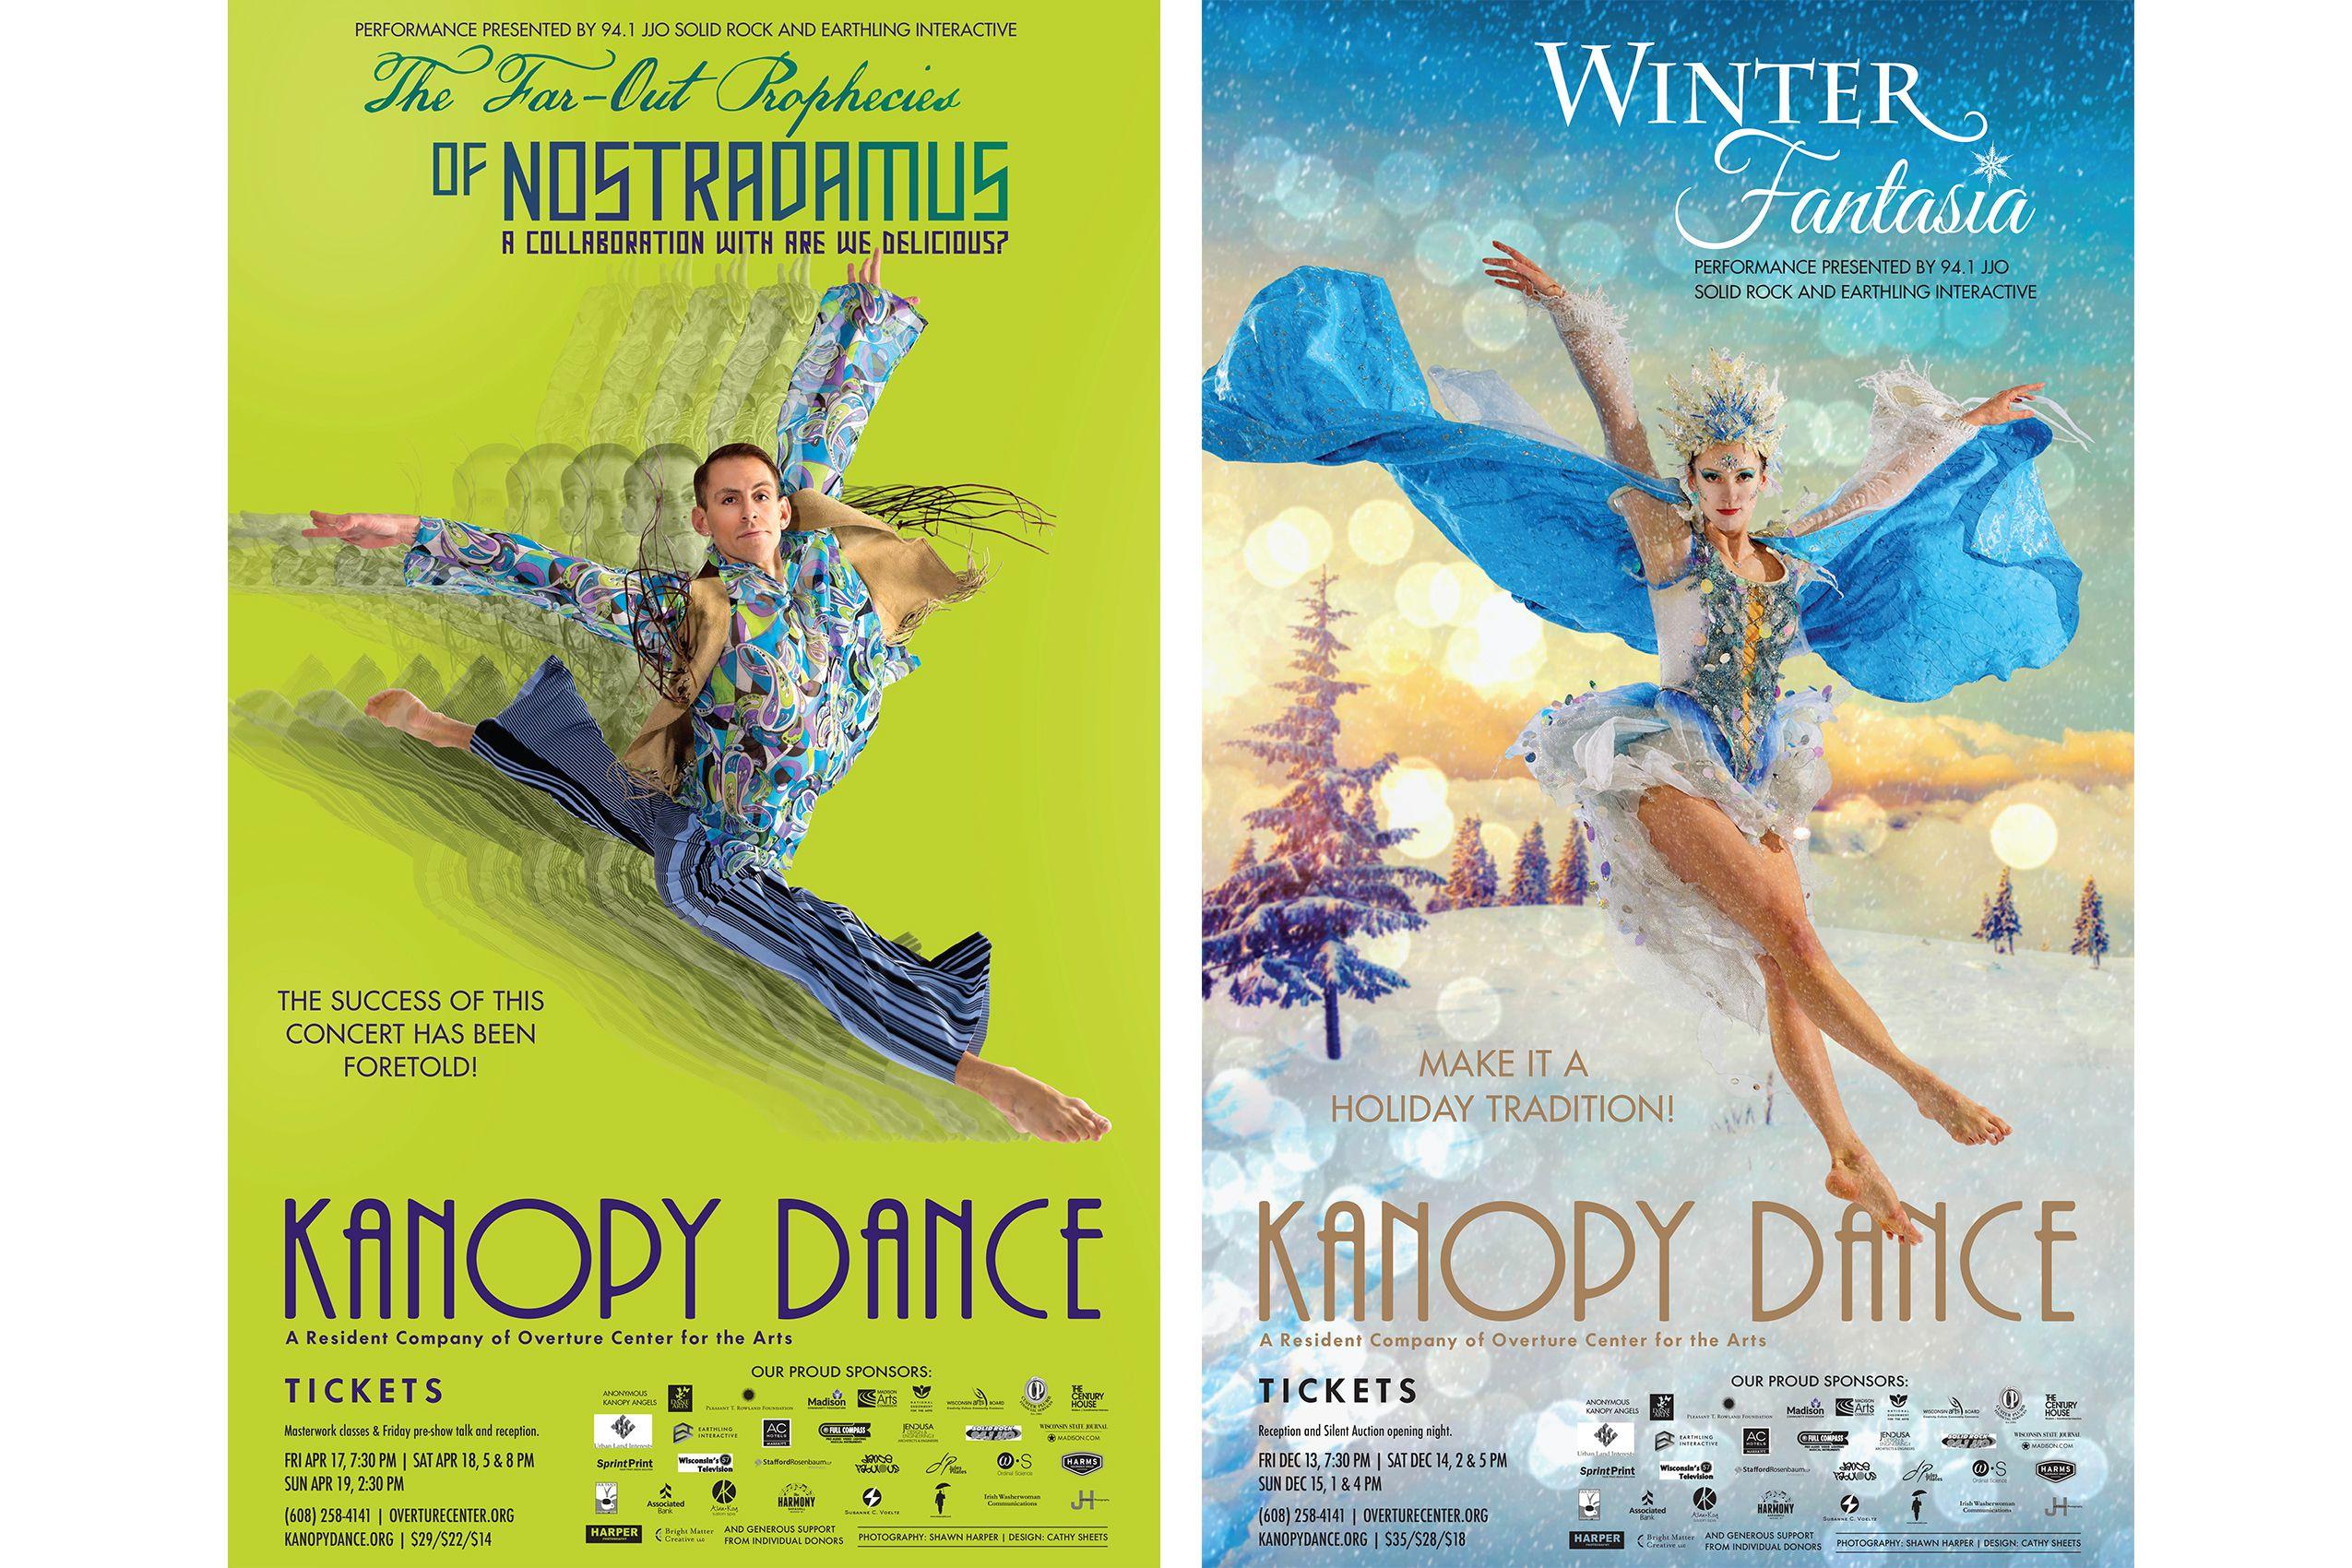 Kanopy_Dance_Poster2_W.jpg